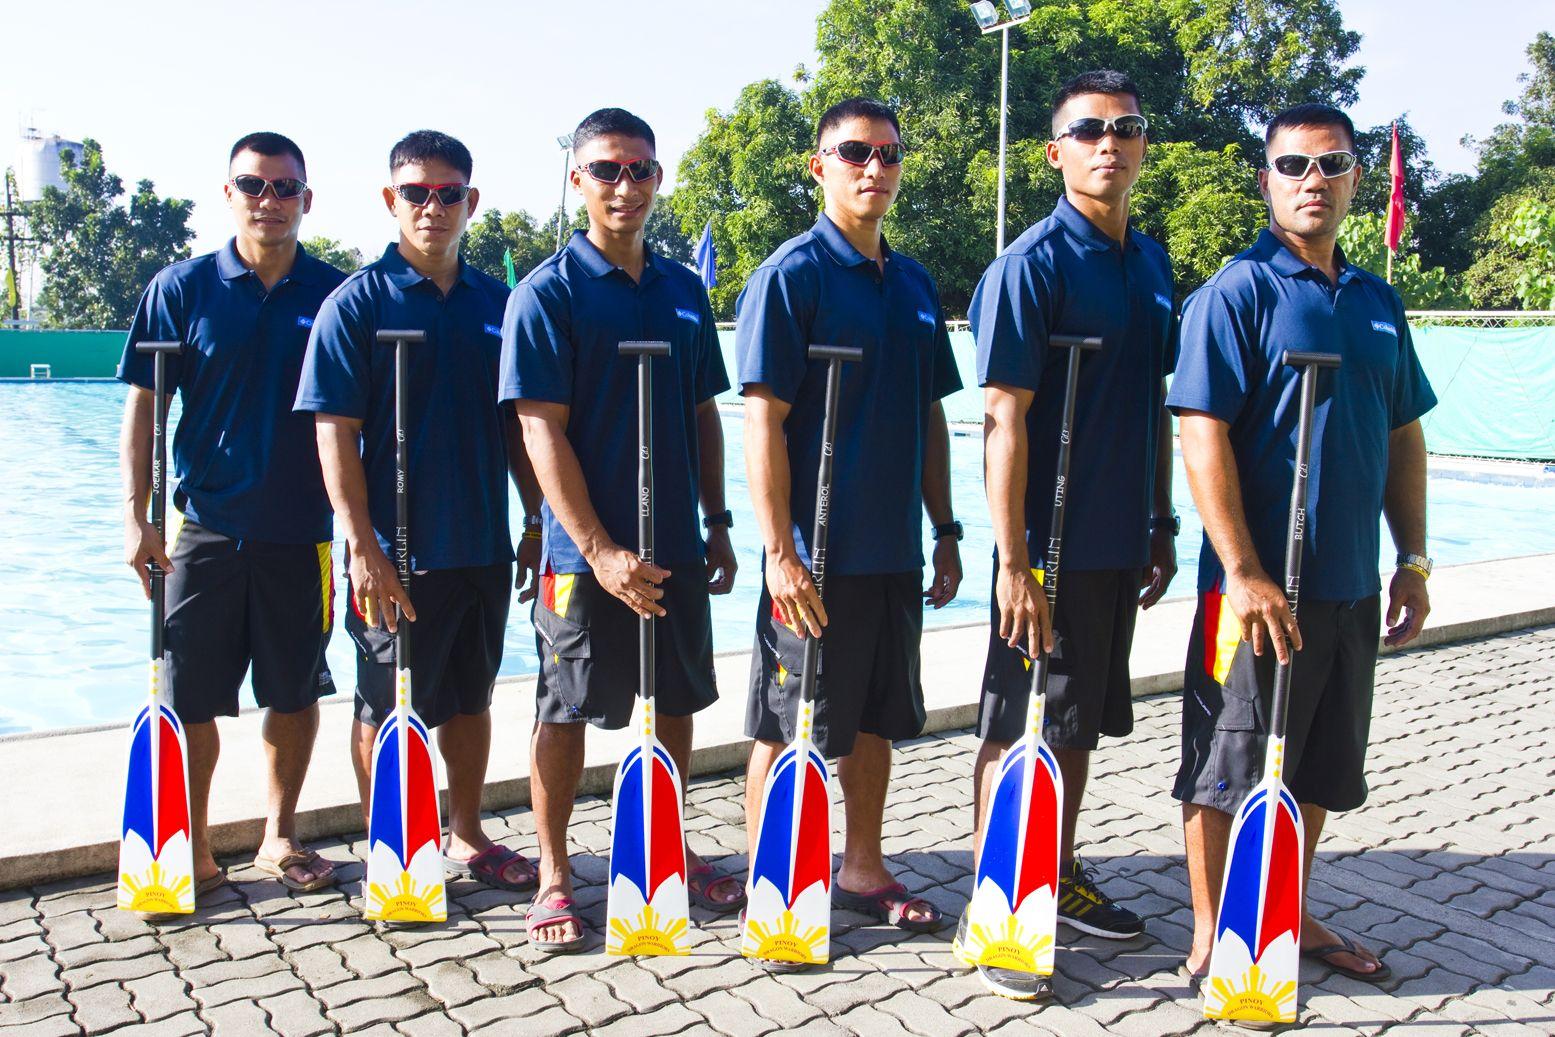 Philippine paddles, Merlin